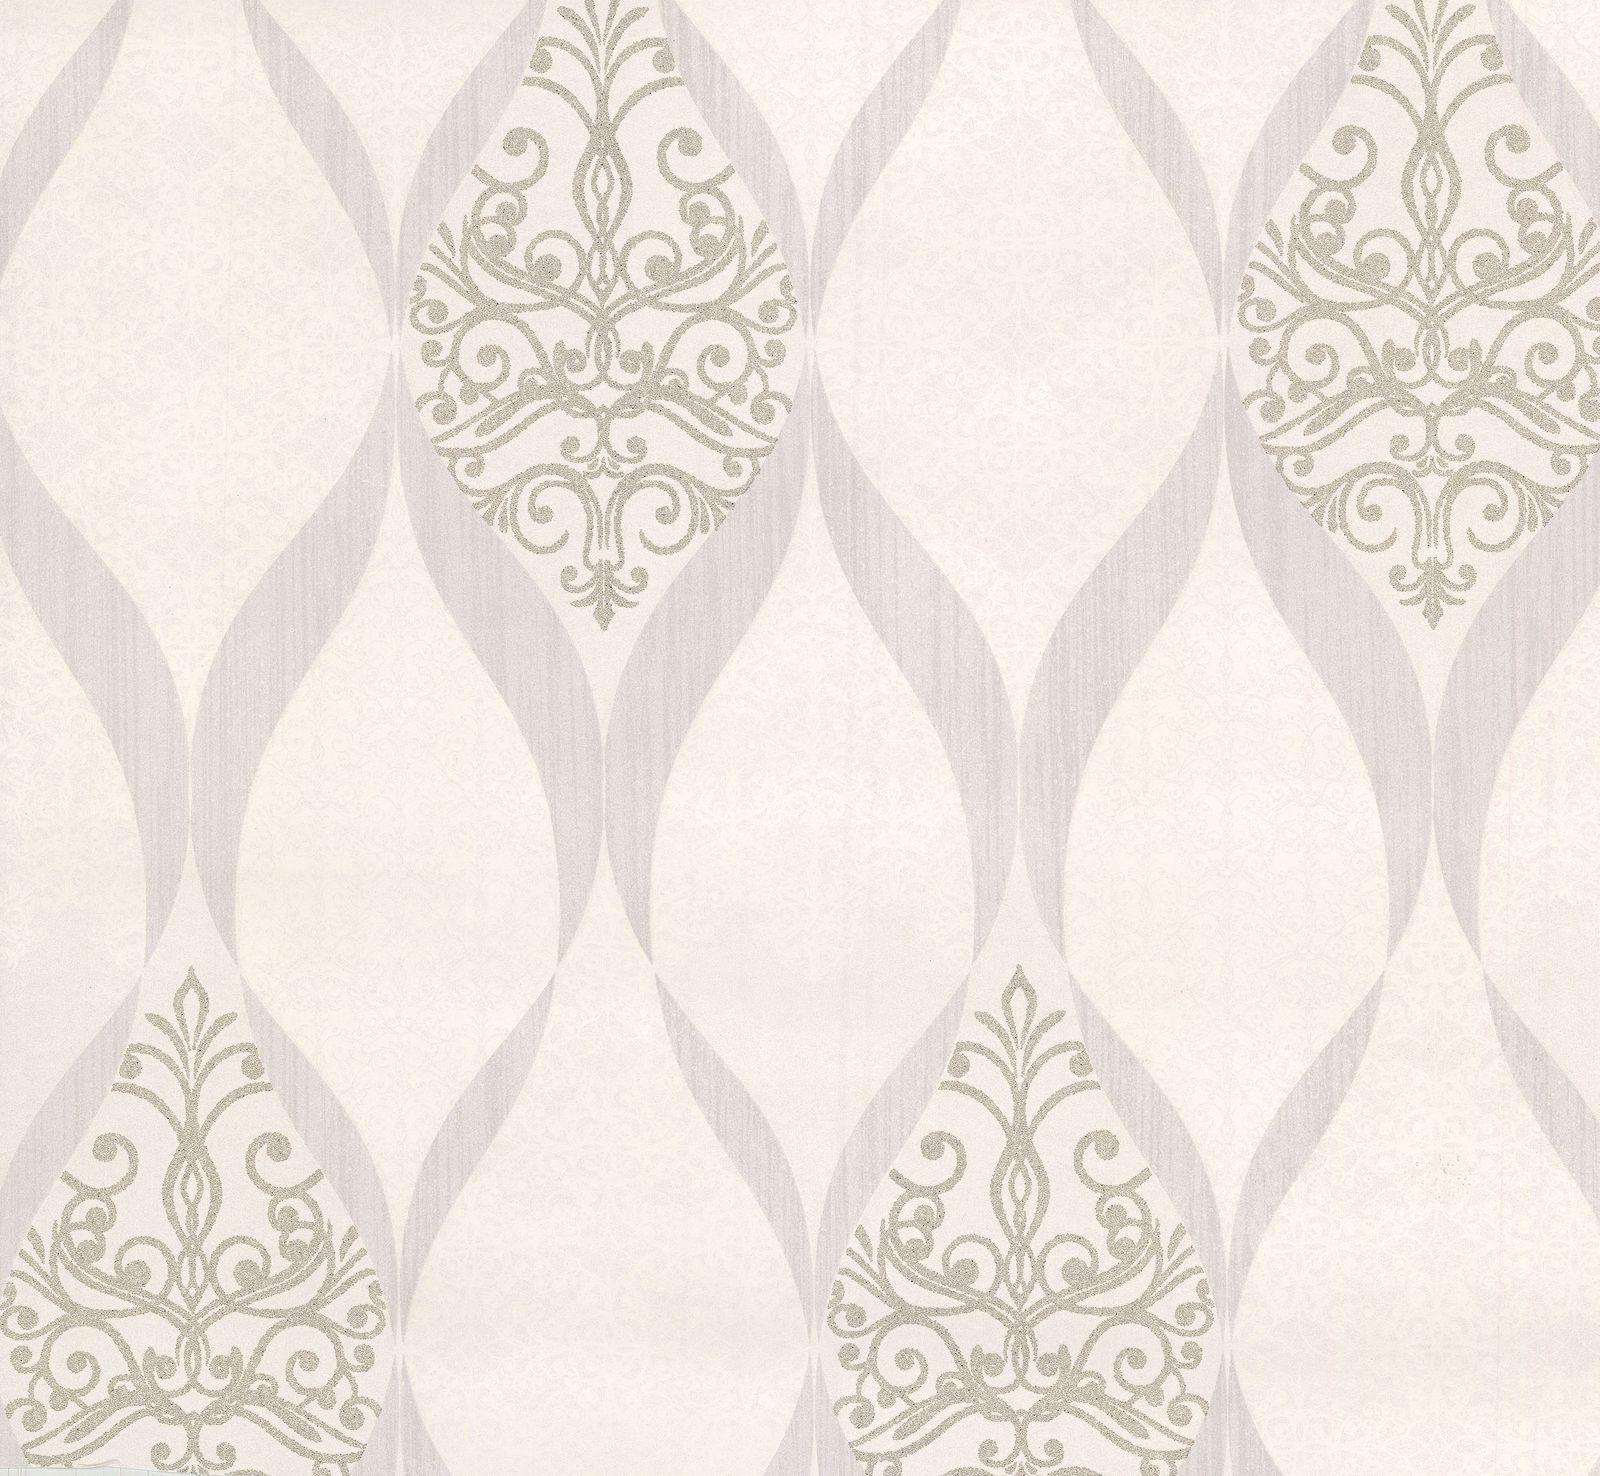 kretschmer deluxe tapete orient glasperlen wei silber 41006 10. Black Bedroom Furniture Sets. Home Design Ideas